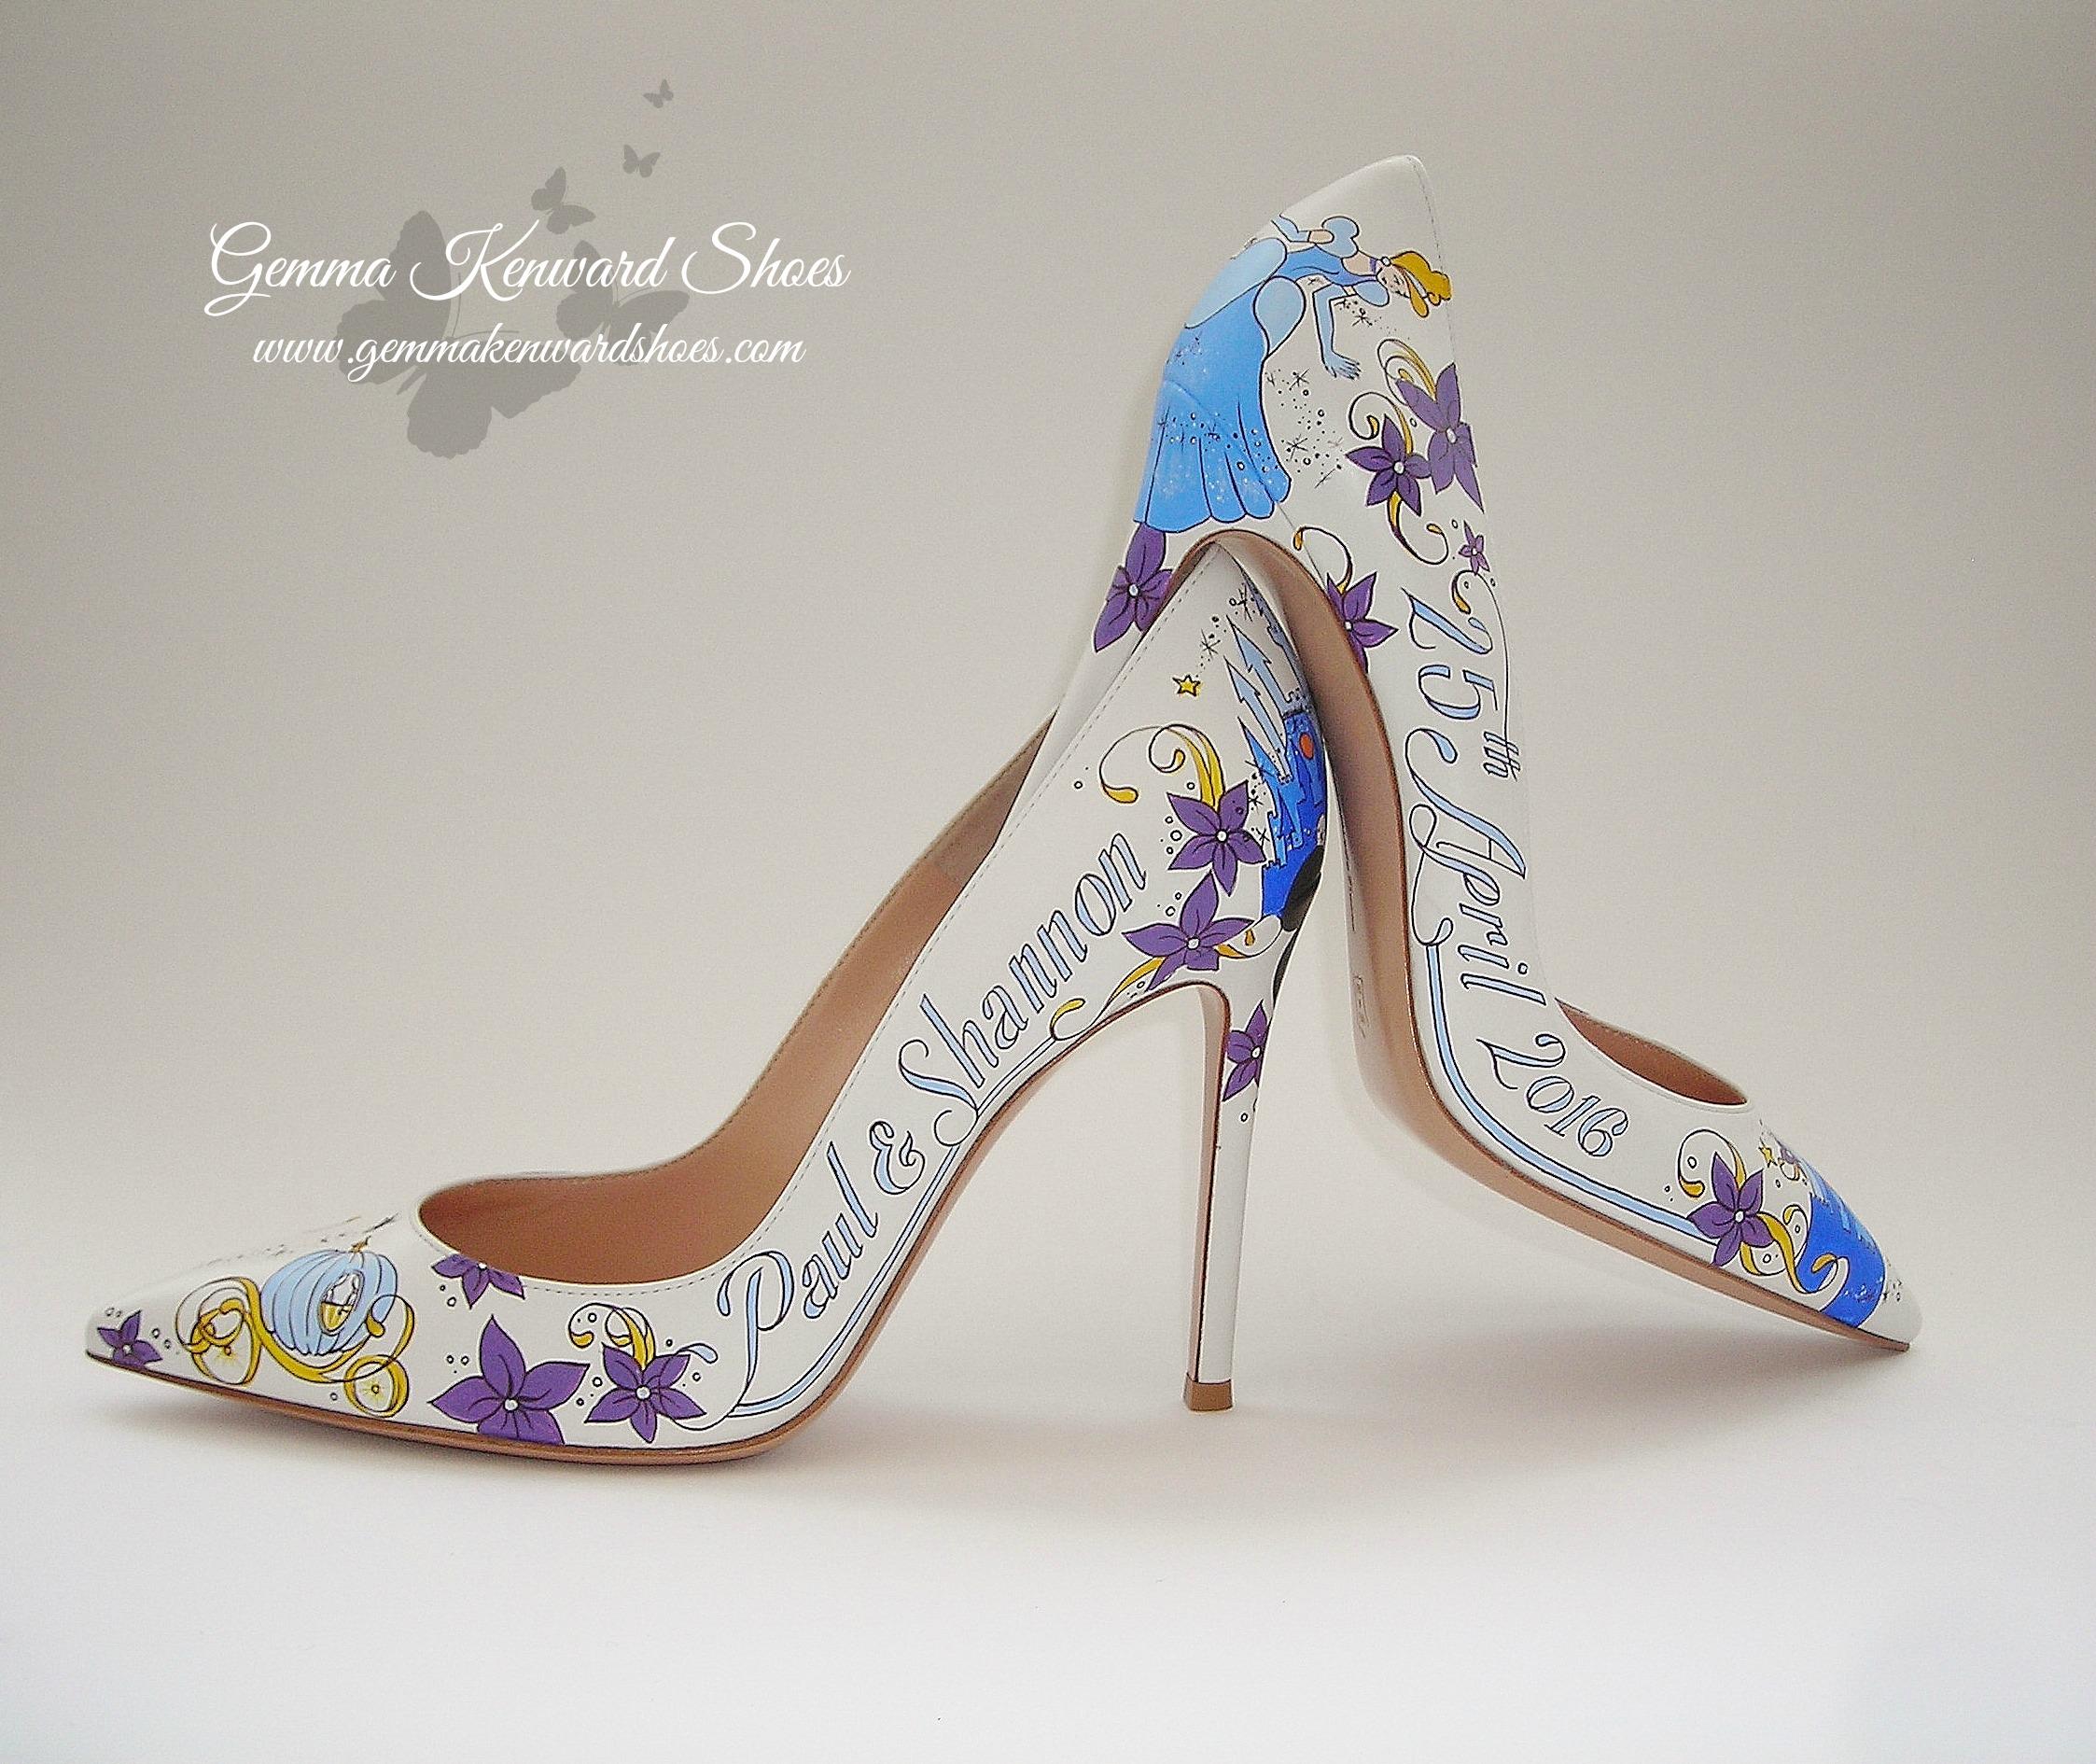 Hand painted Disney Princess wedding shoes